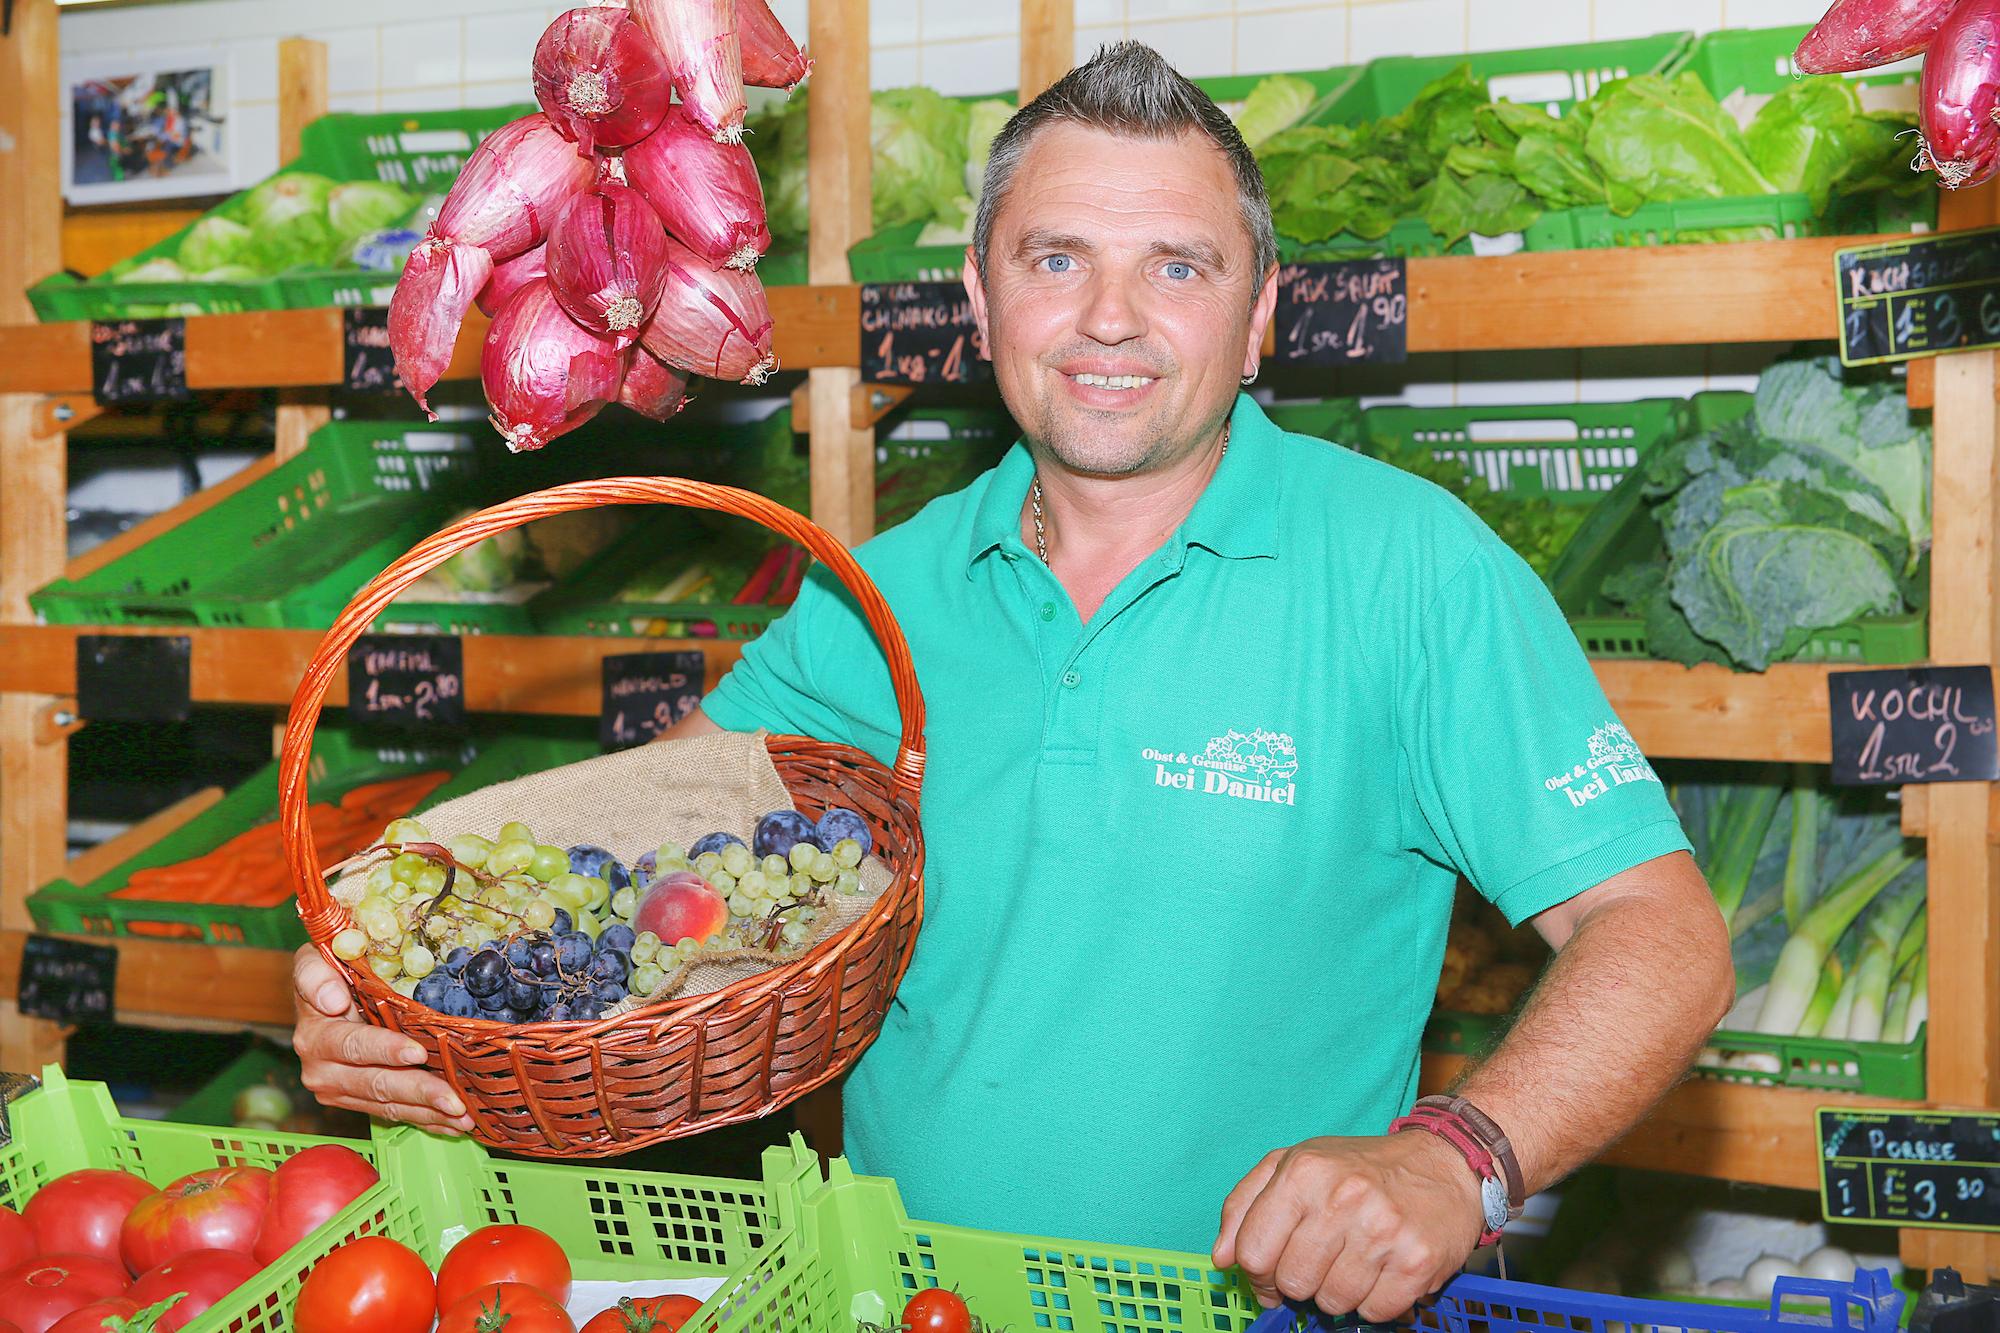 Daniel vor seinem Obst- & Gemüse-Stand. Bild: Robert Sturm - cordbase.com